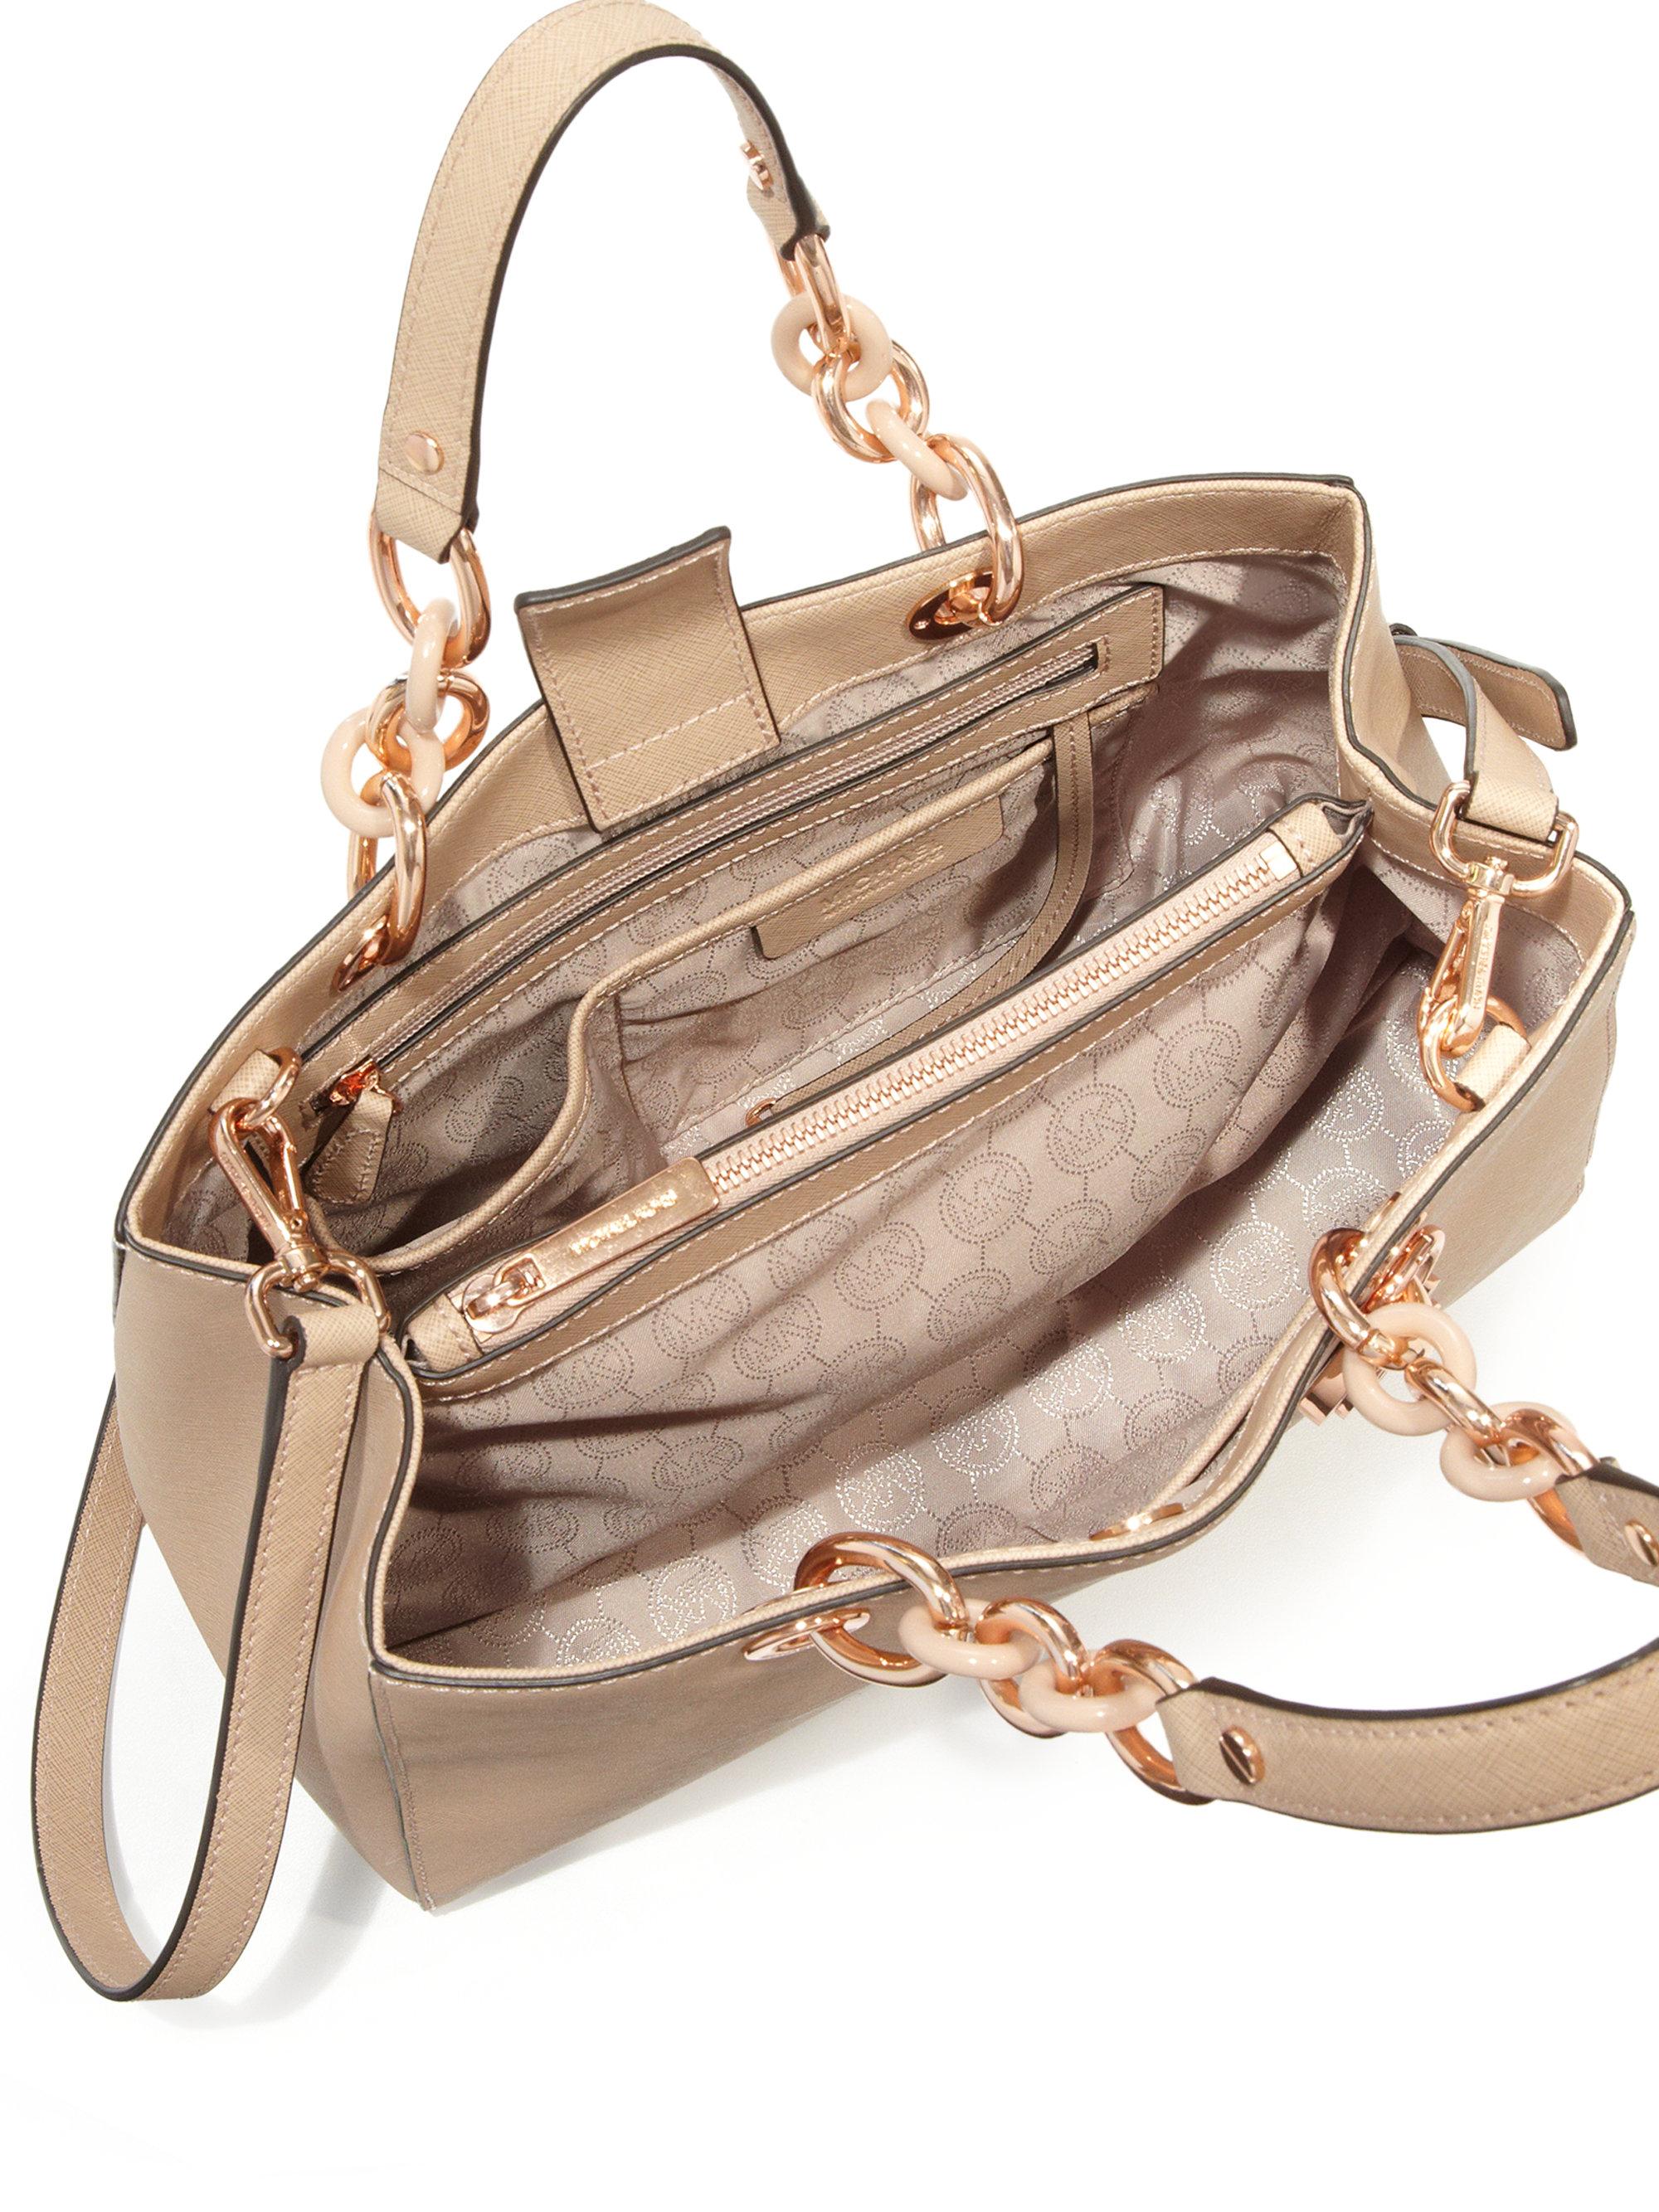 cf961786ab8c ... new zealand lyst michael michael kors cynthia medium saffiano leather  satchel ba28a 3fd1c